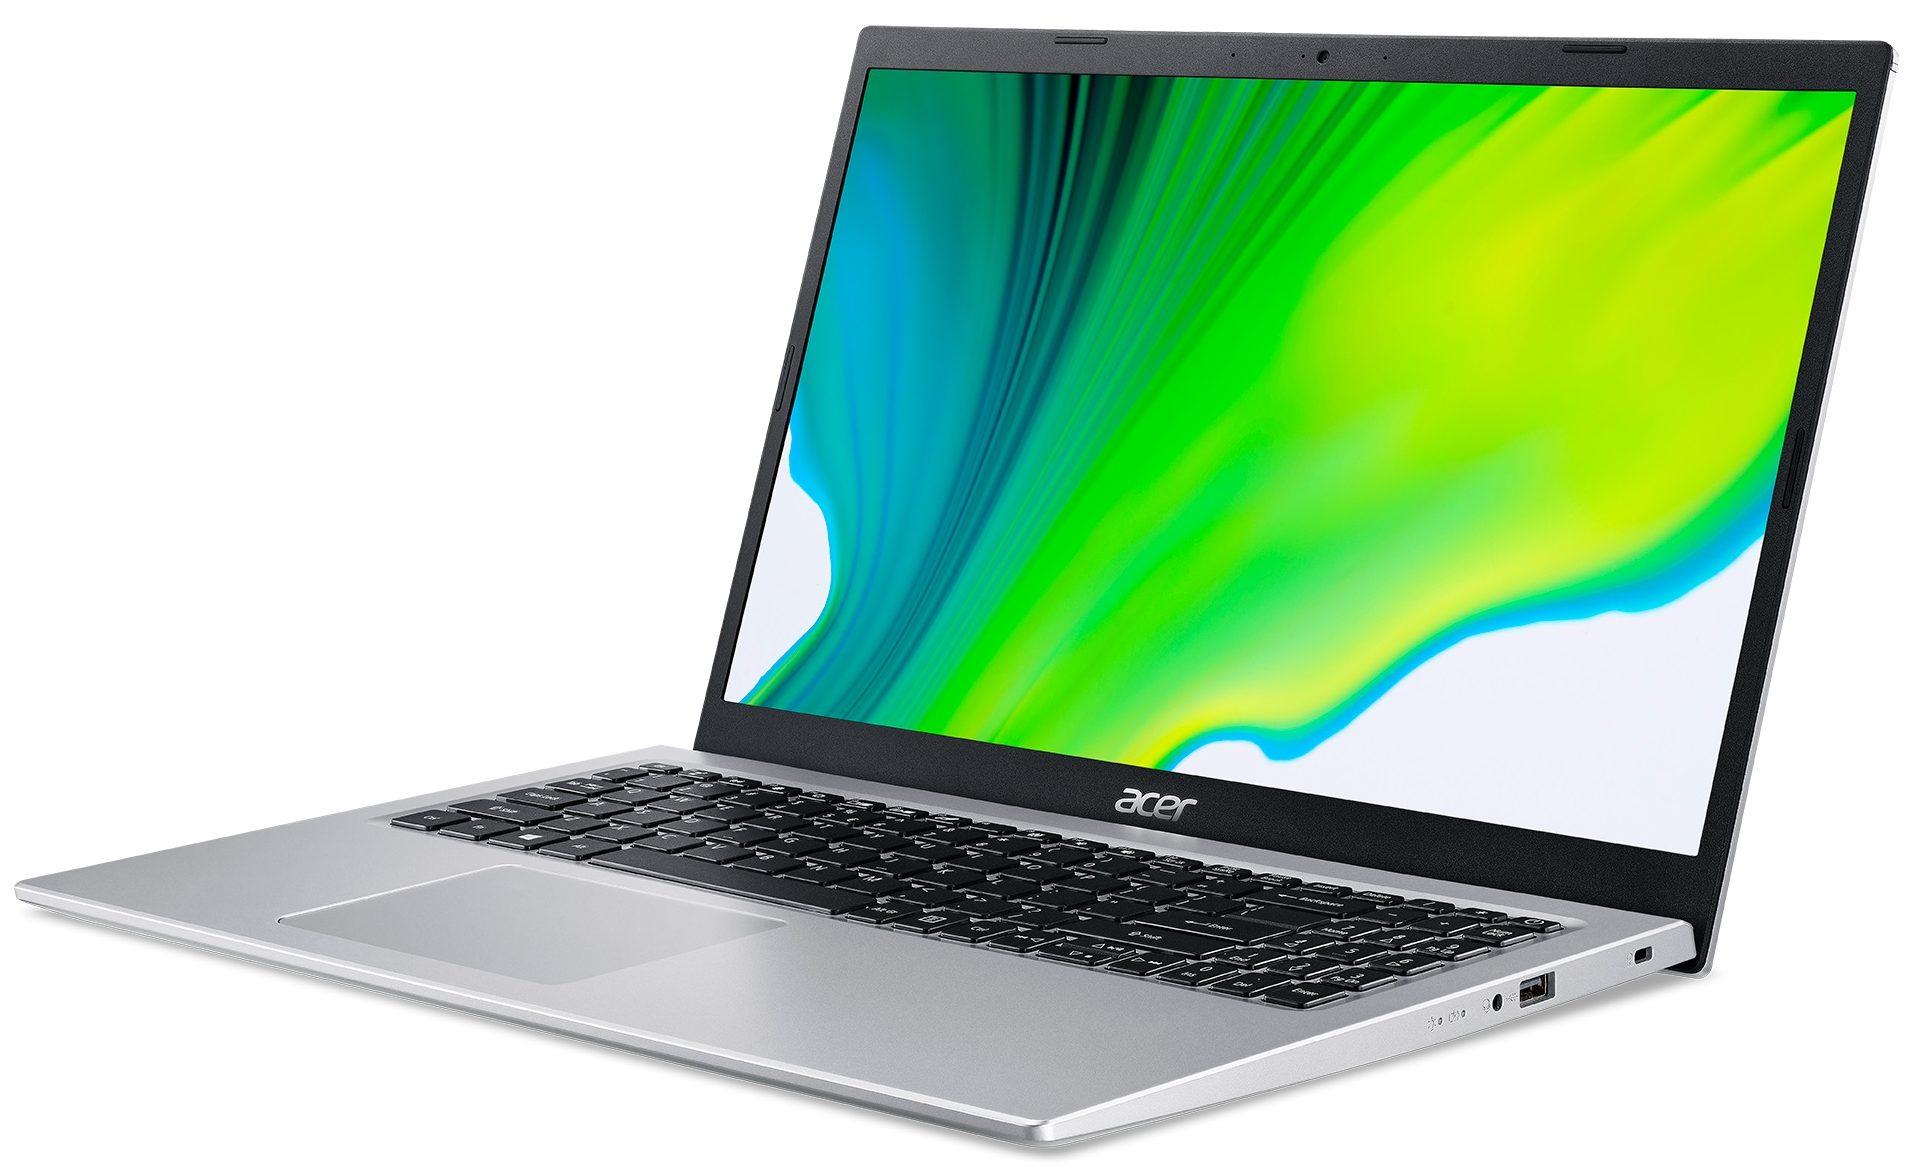 Acer Aspire 5 (A515-56 / A515-56G / A515-56S / A515-56T)